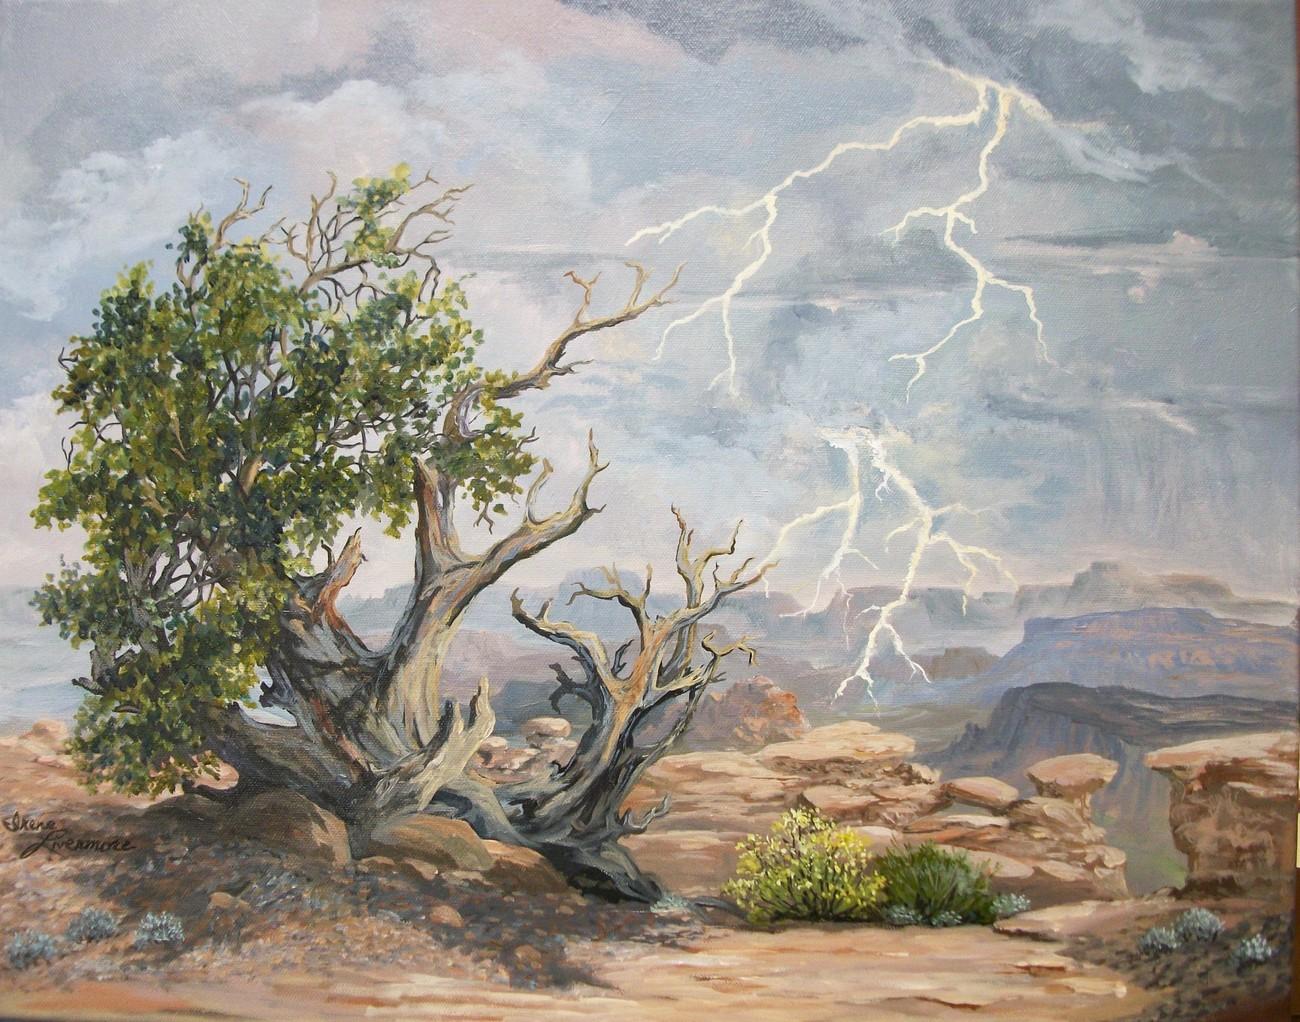 Utahs Vast Cedar Desert Canyons Landscape Original